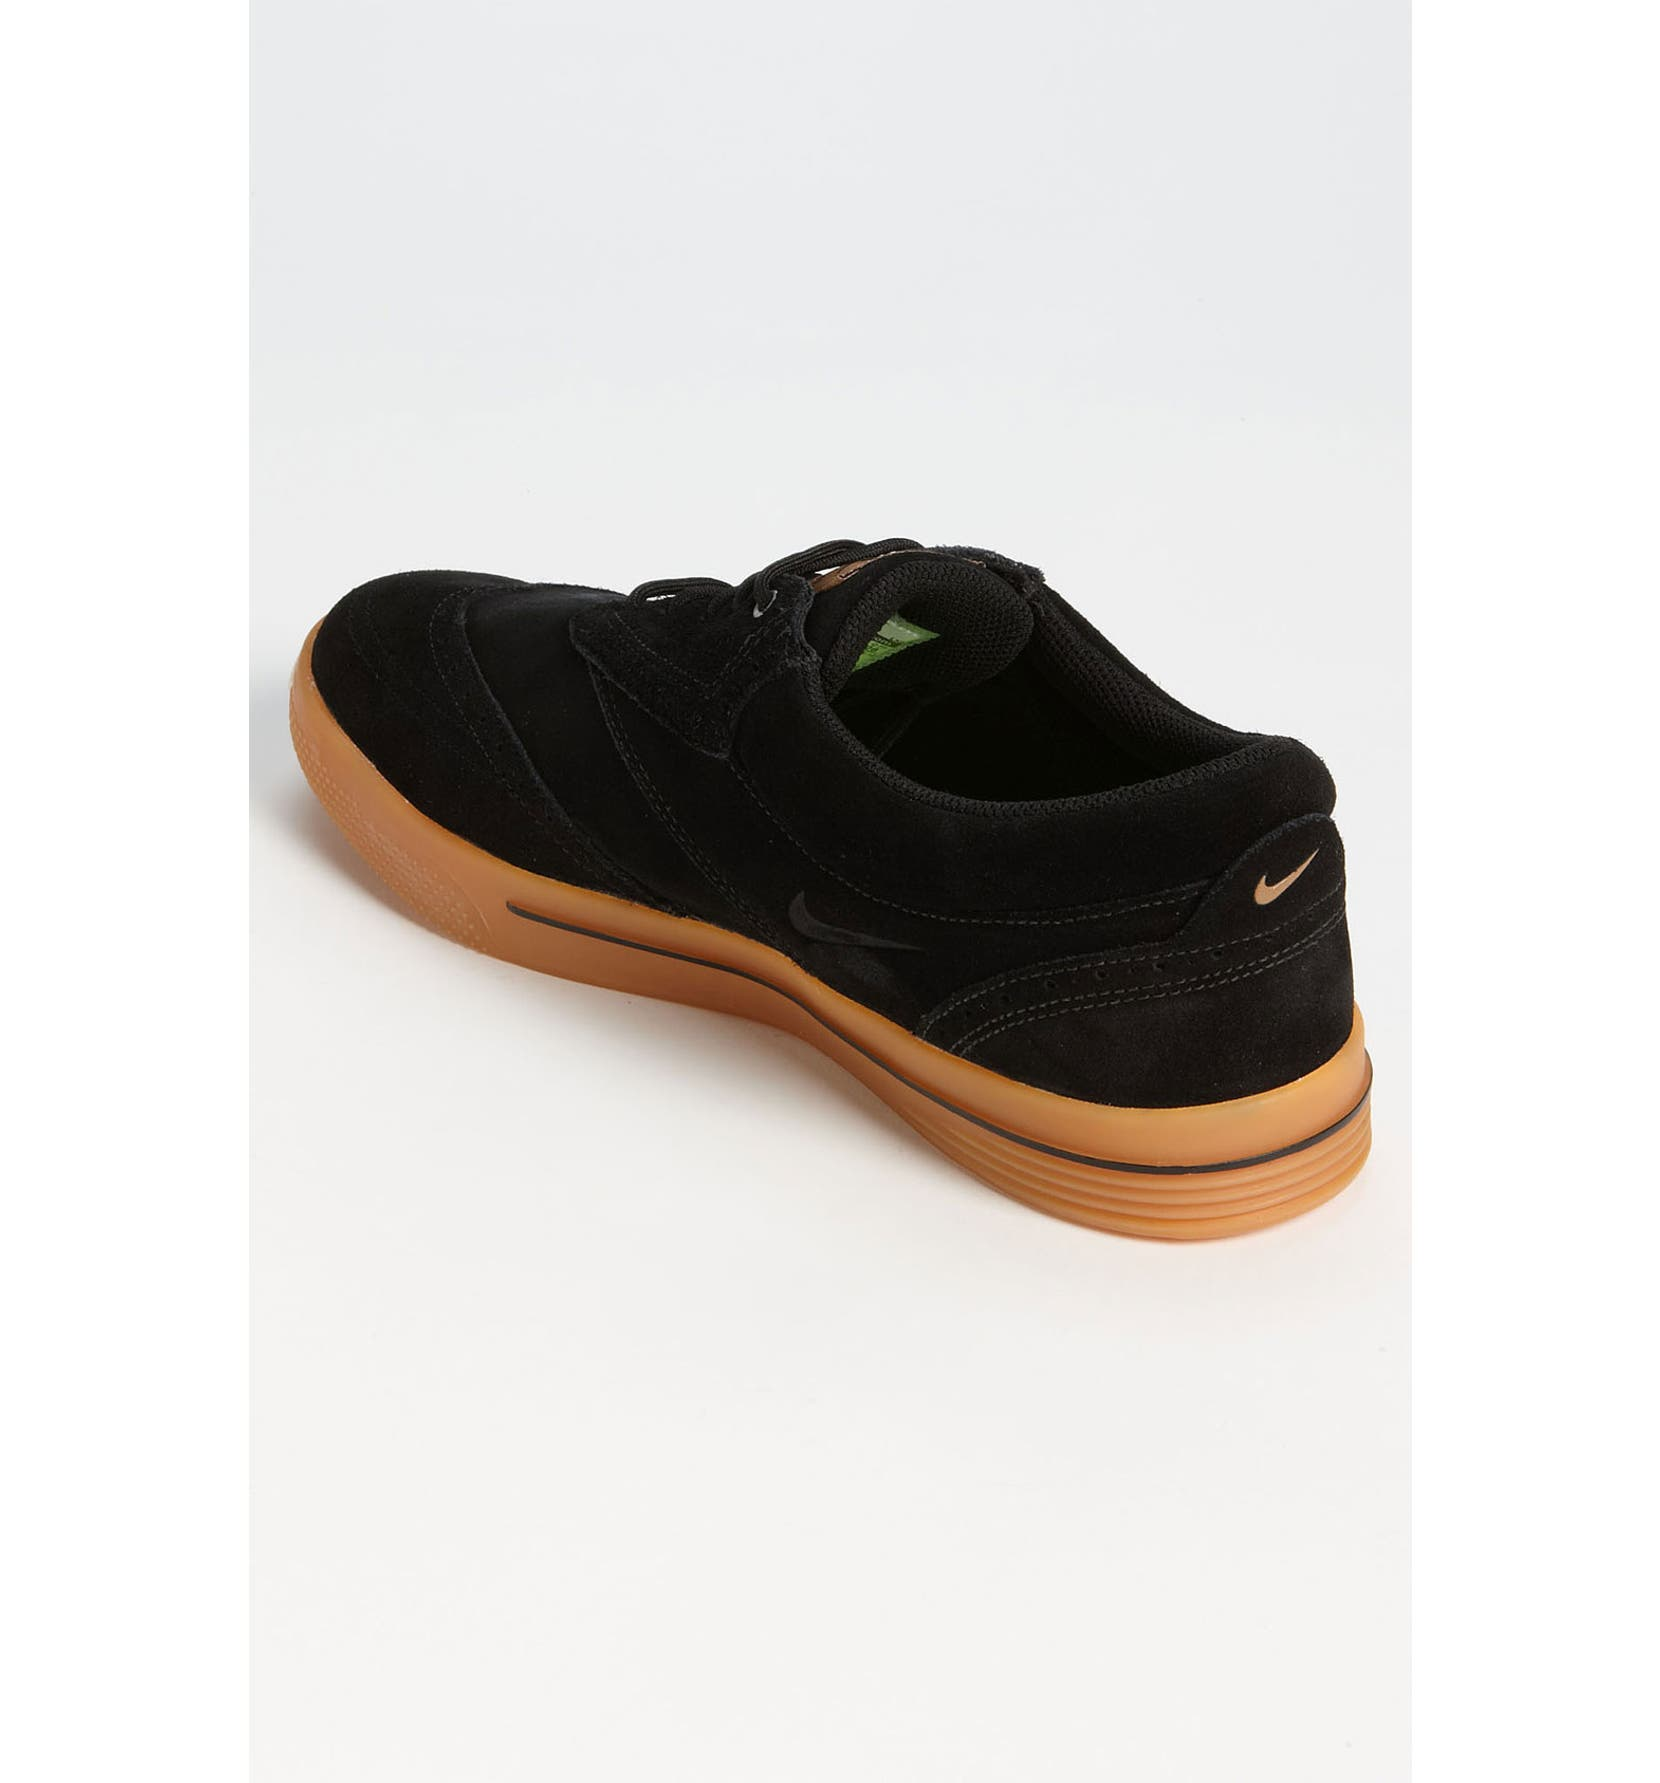 391ad4ff70176 'Lunar Swingtip' Suede Golf Shoe